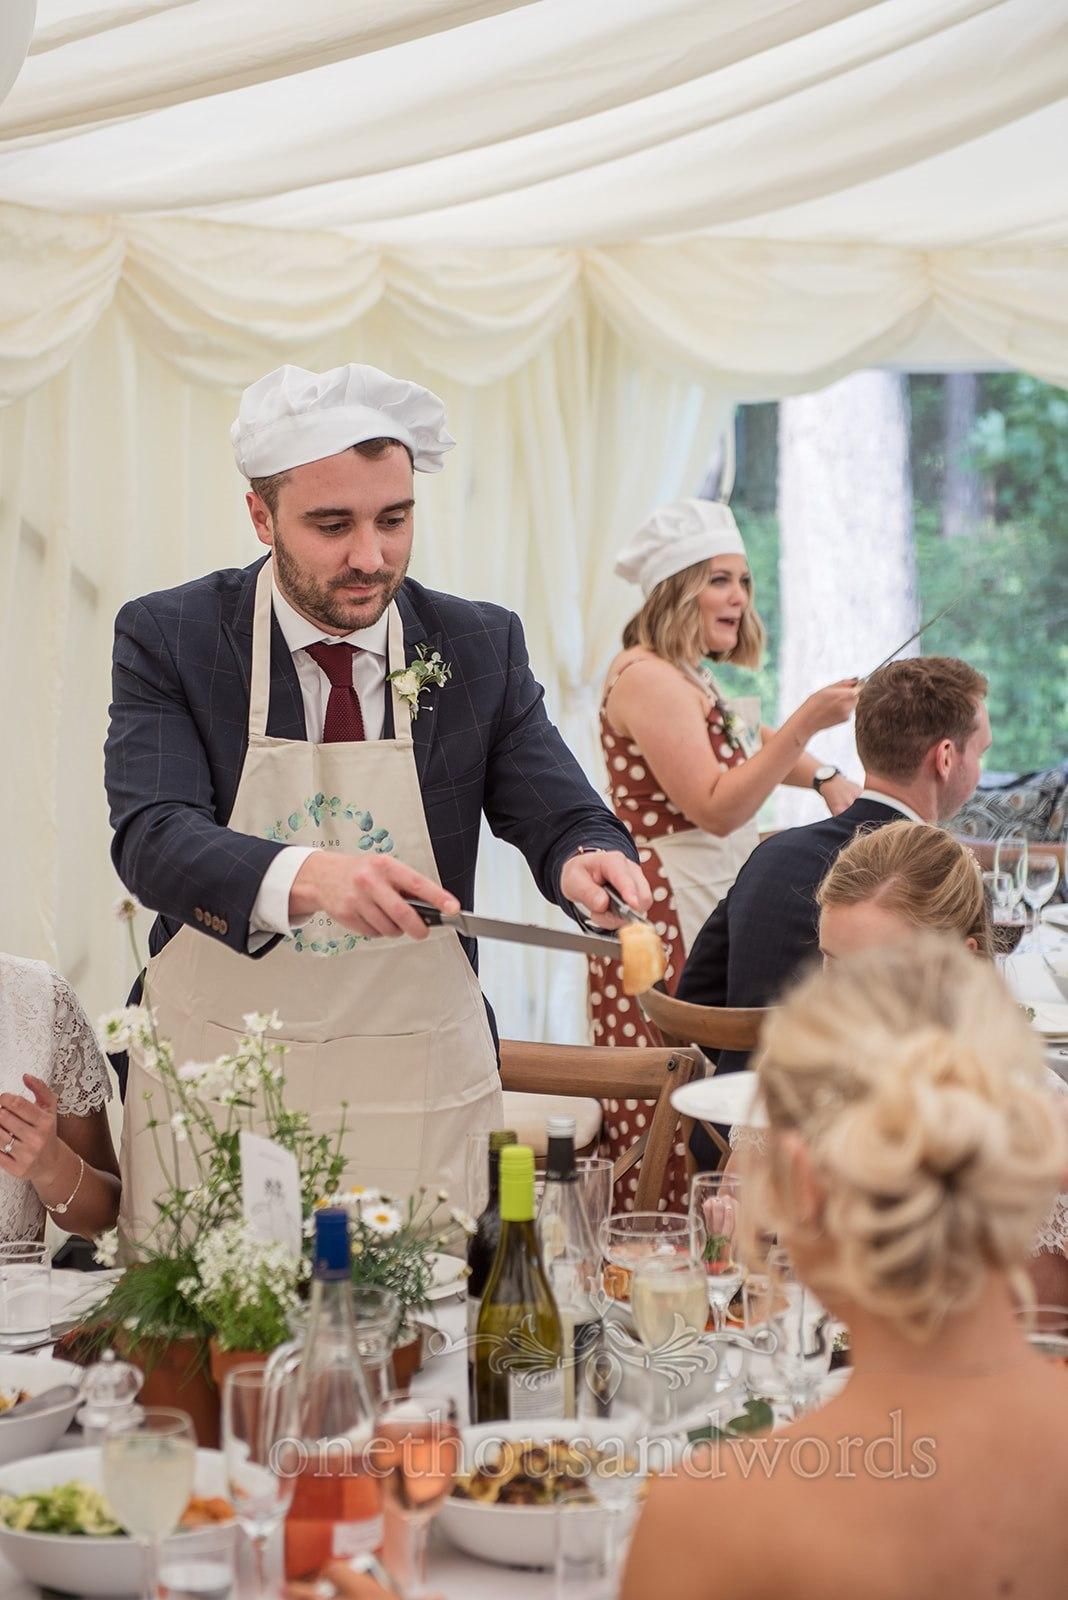 Wedding Breakfast Table Servers - One Thousand Words Photography